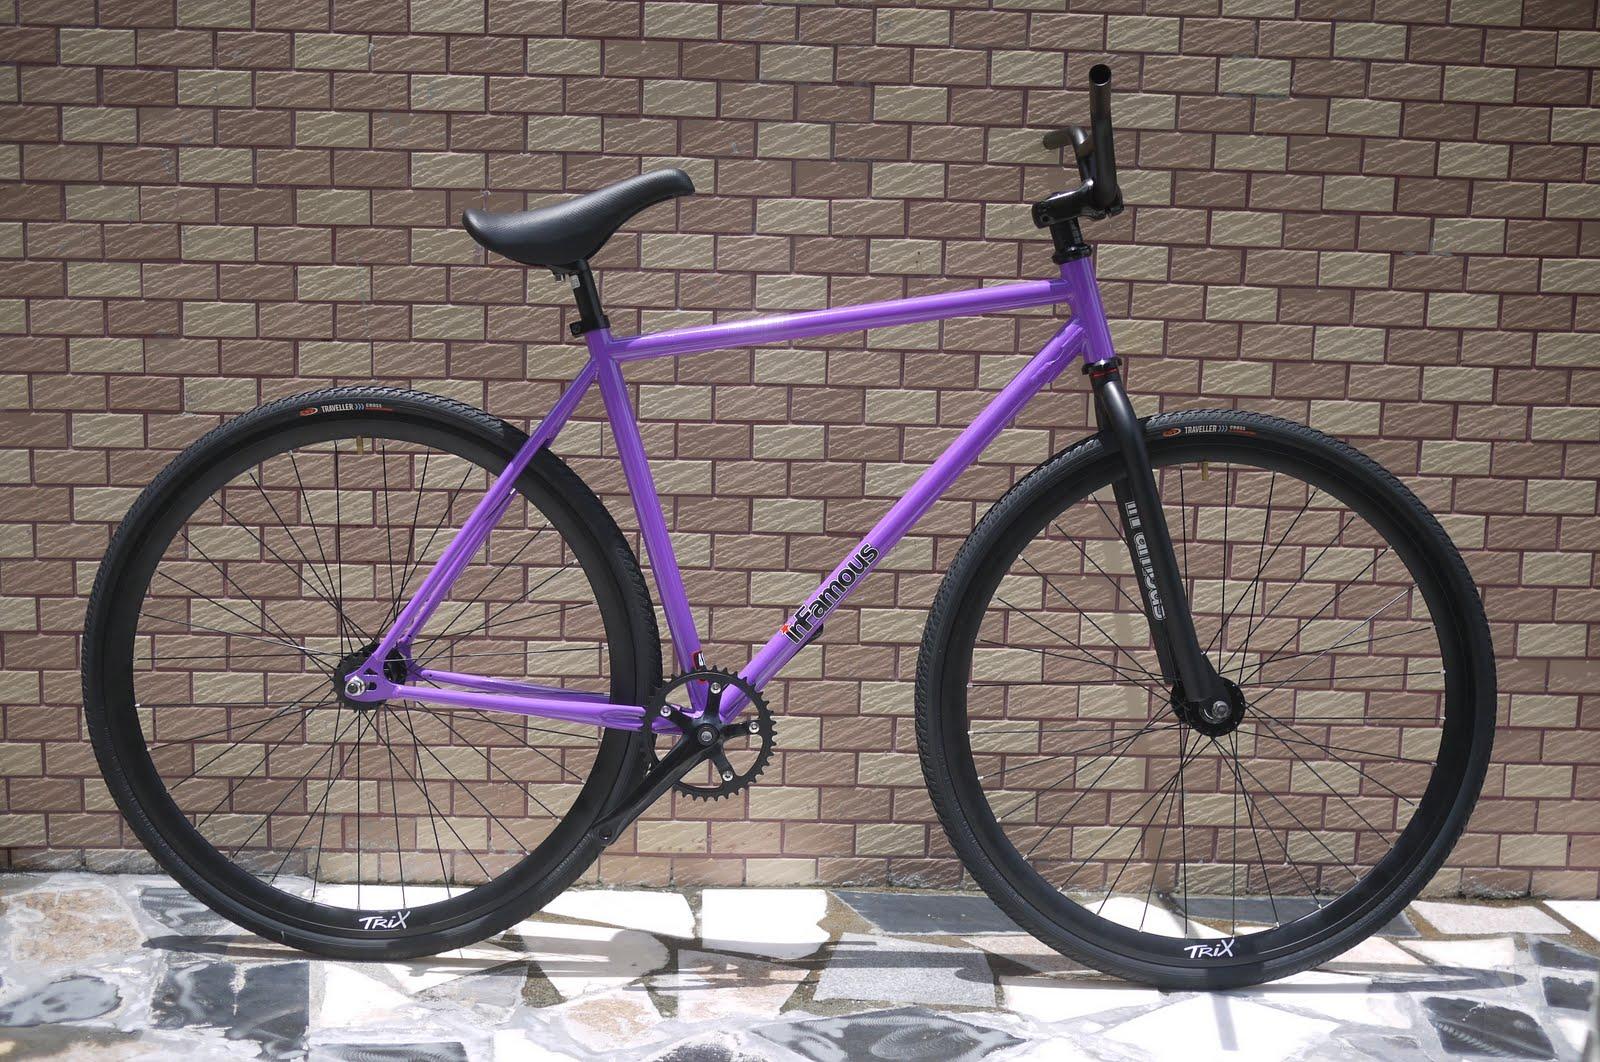 The Best Fixie Cinelli Let S Go Biking